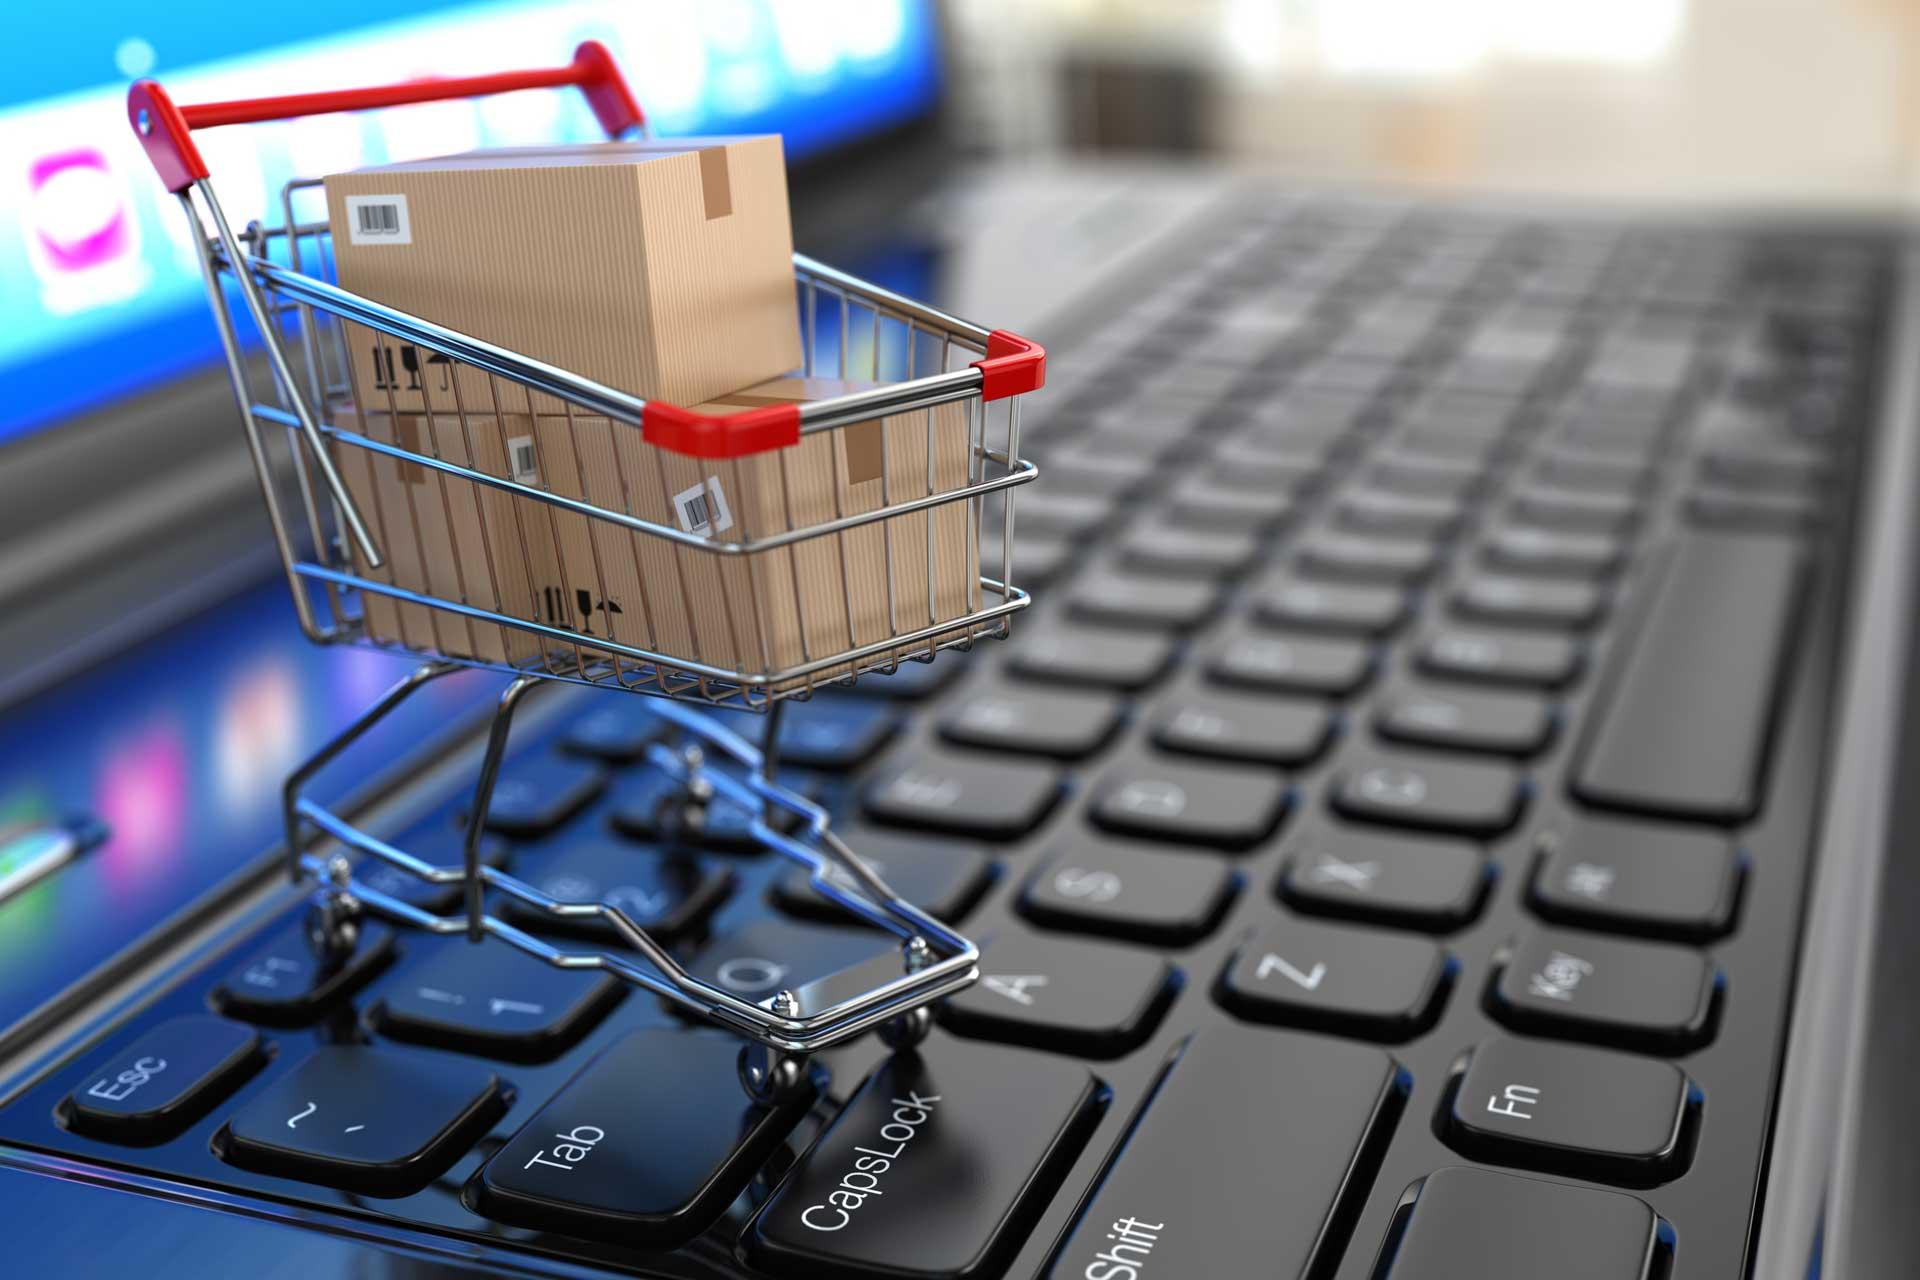 Tiendas Online Negocio Tu Dropshipping Automatizadas Emprende ZiuPkOX